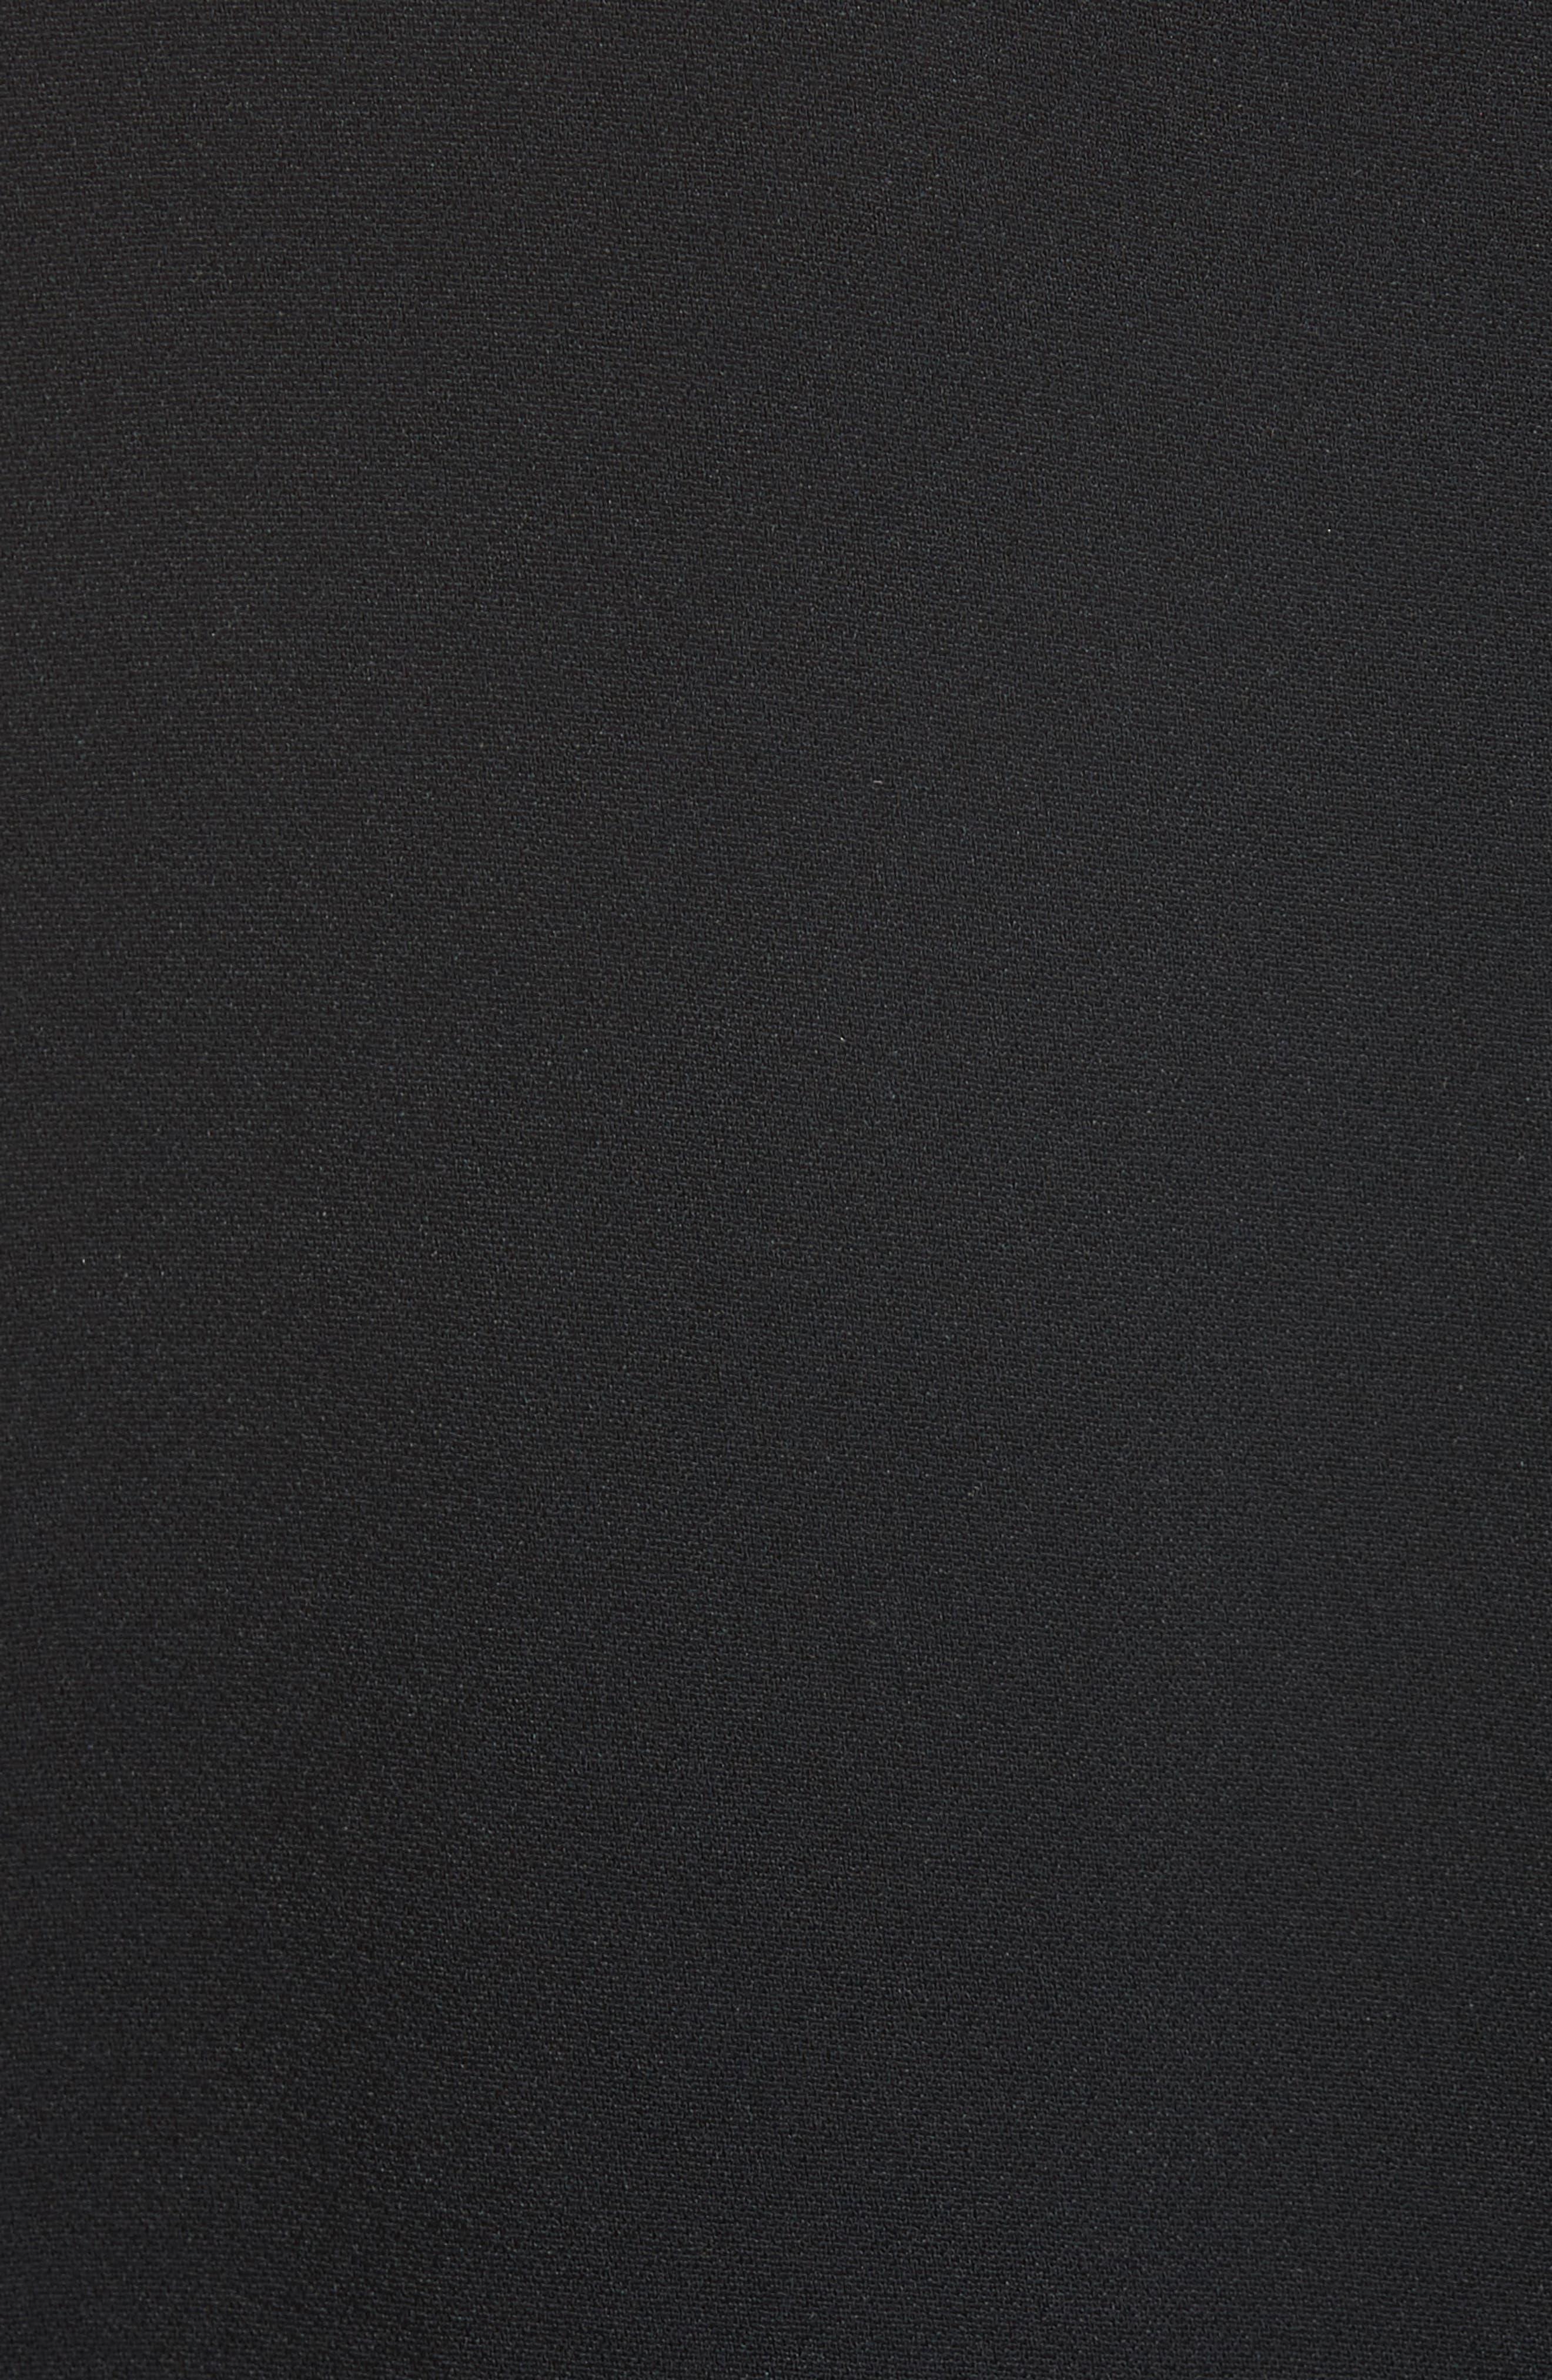 Stretch Cady Fringe Top,                             Alternate thumbnail 3, color,                             Black